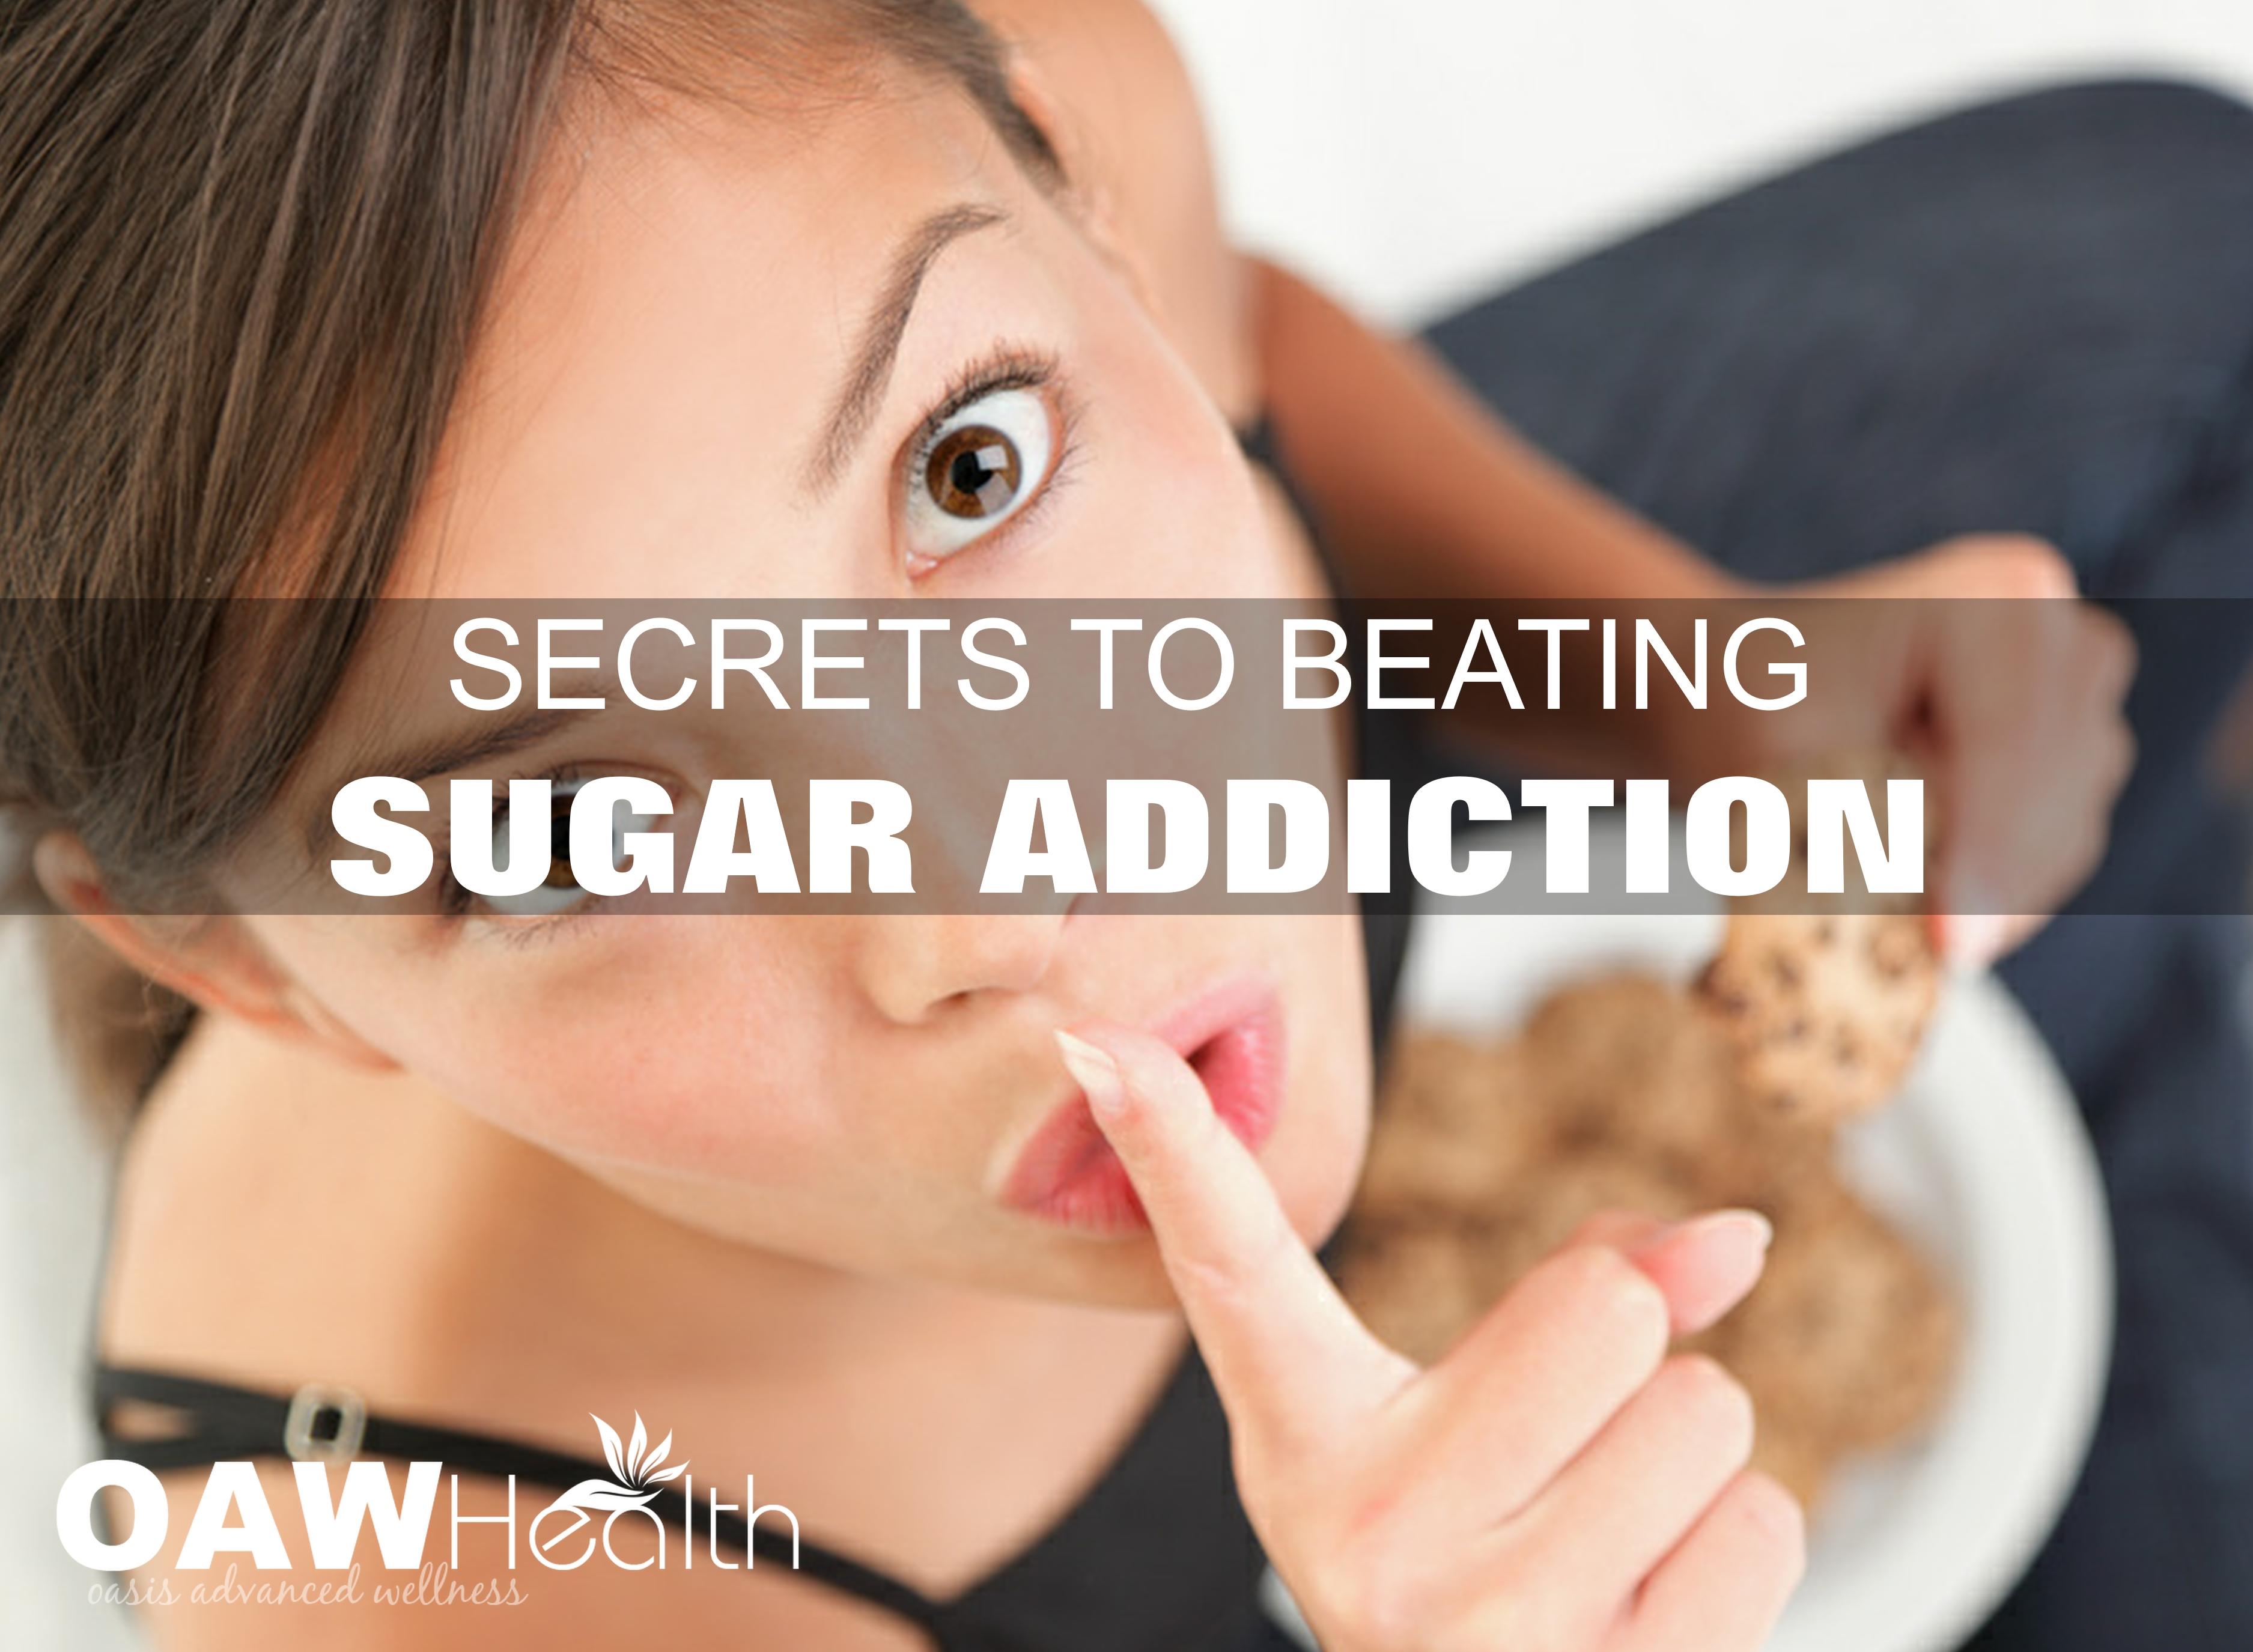 Secrets to Beating Sugar Addiction